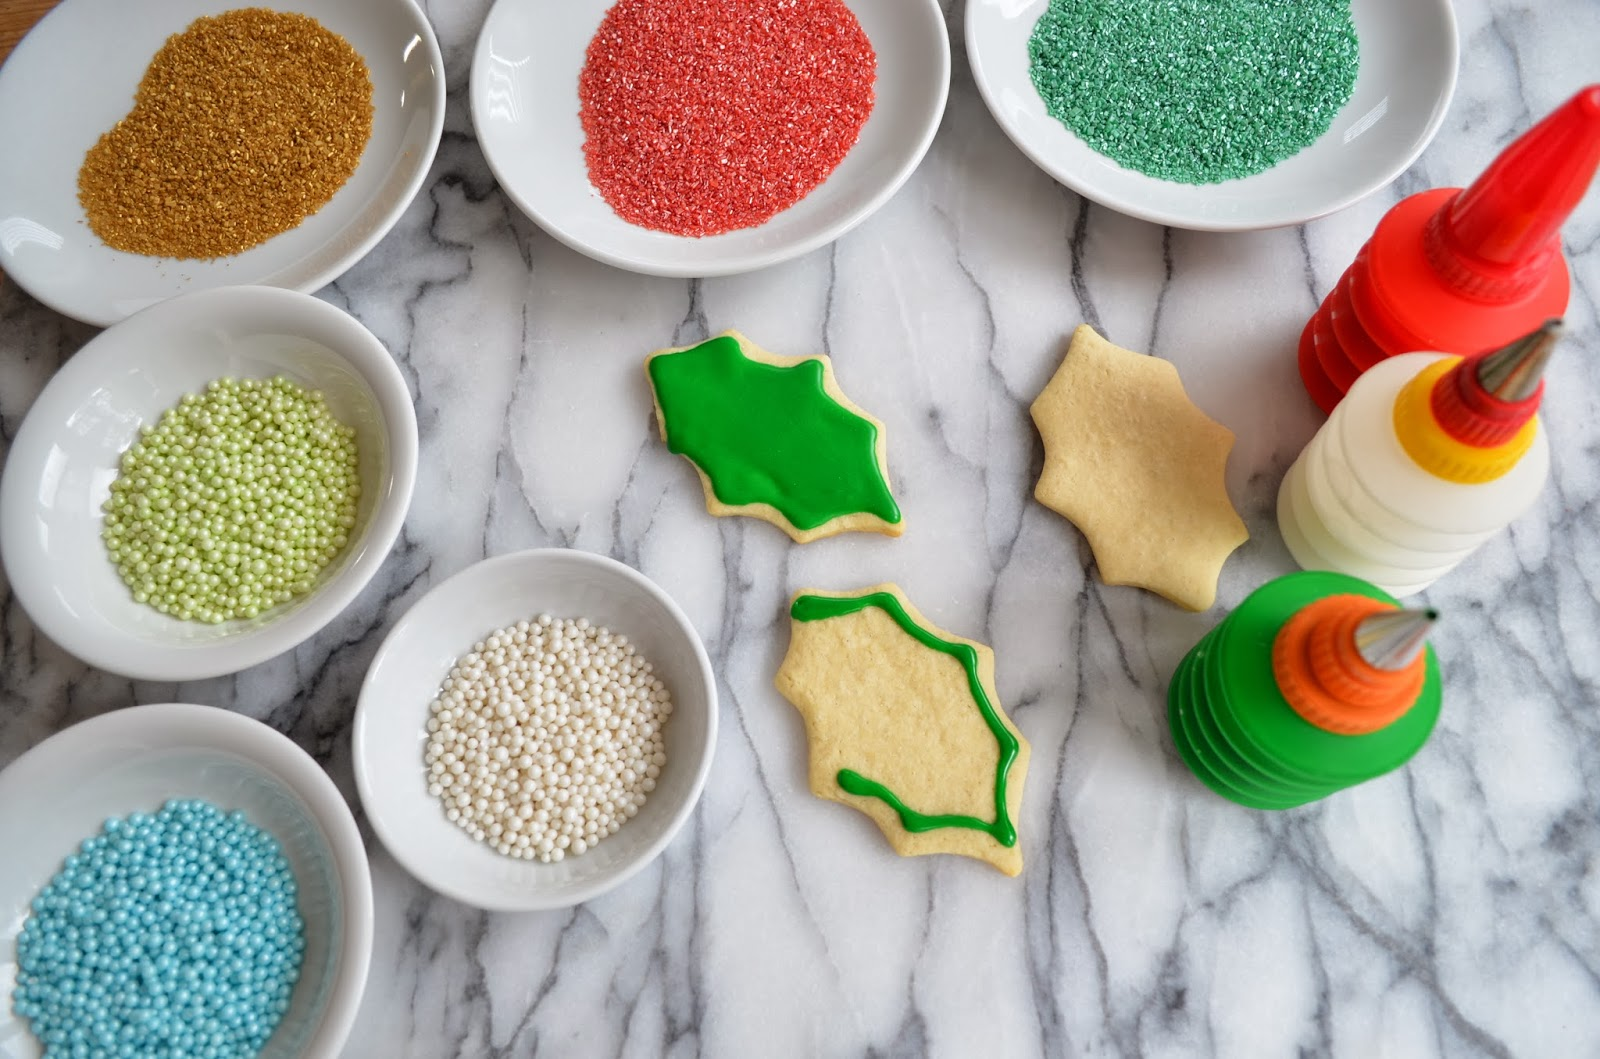 Christmas cookies - decorating.